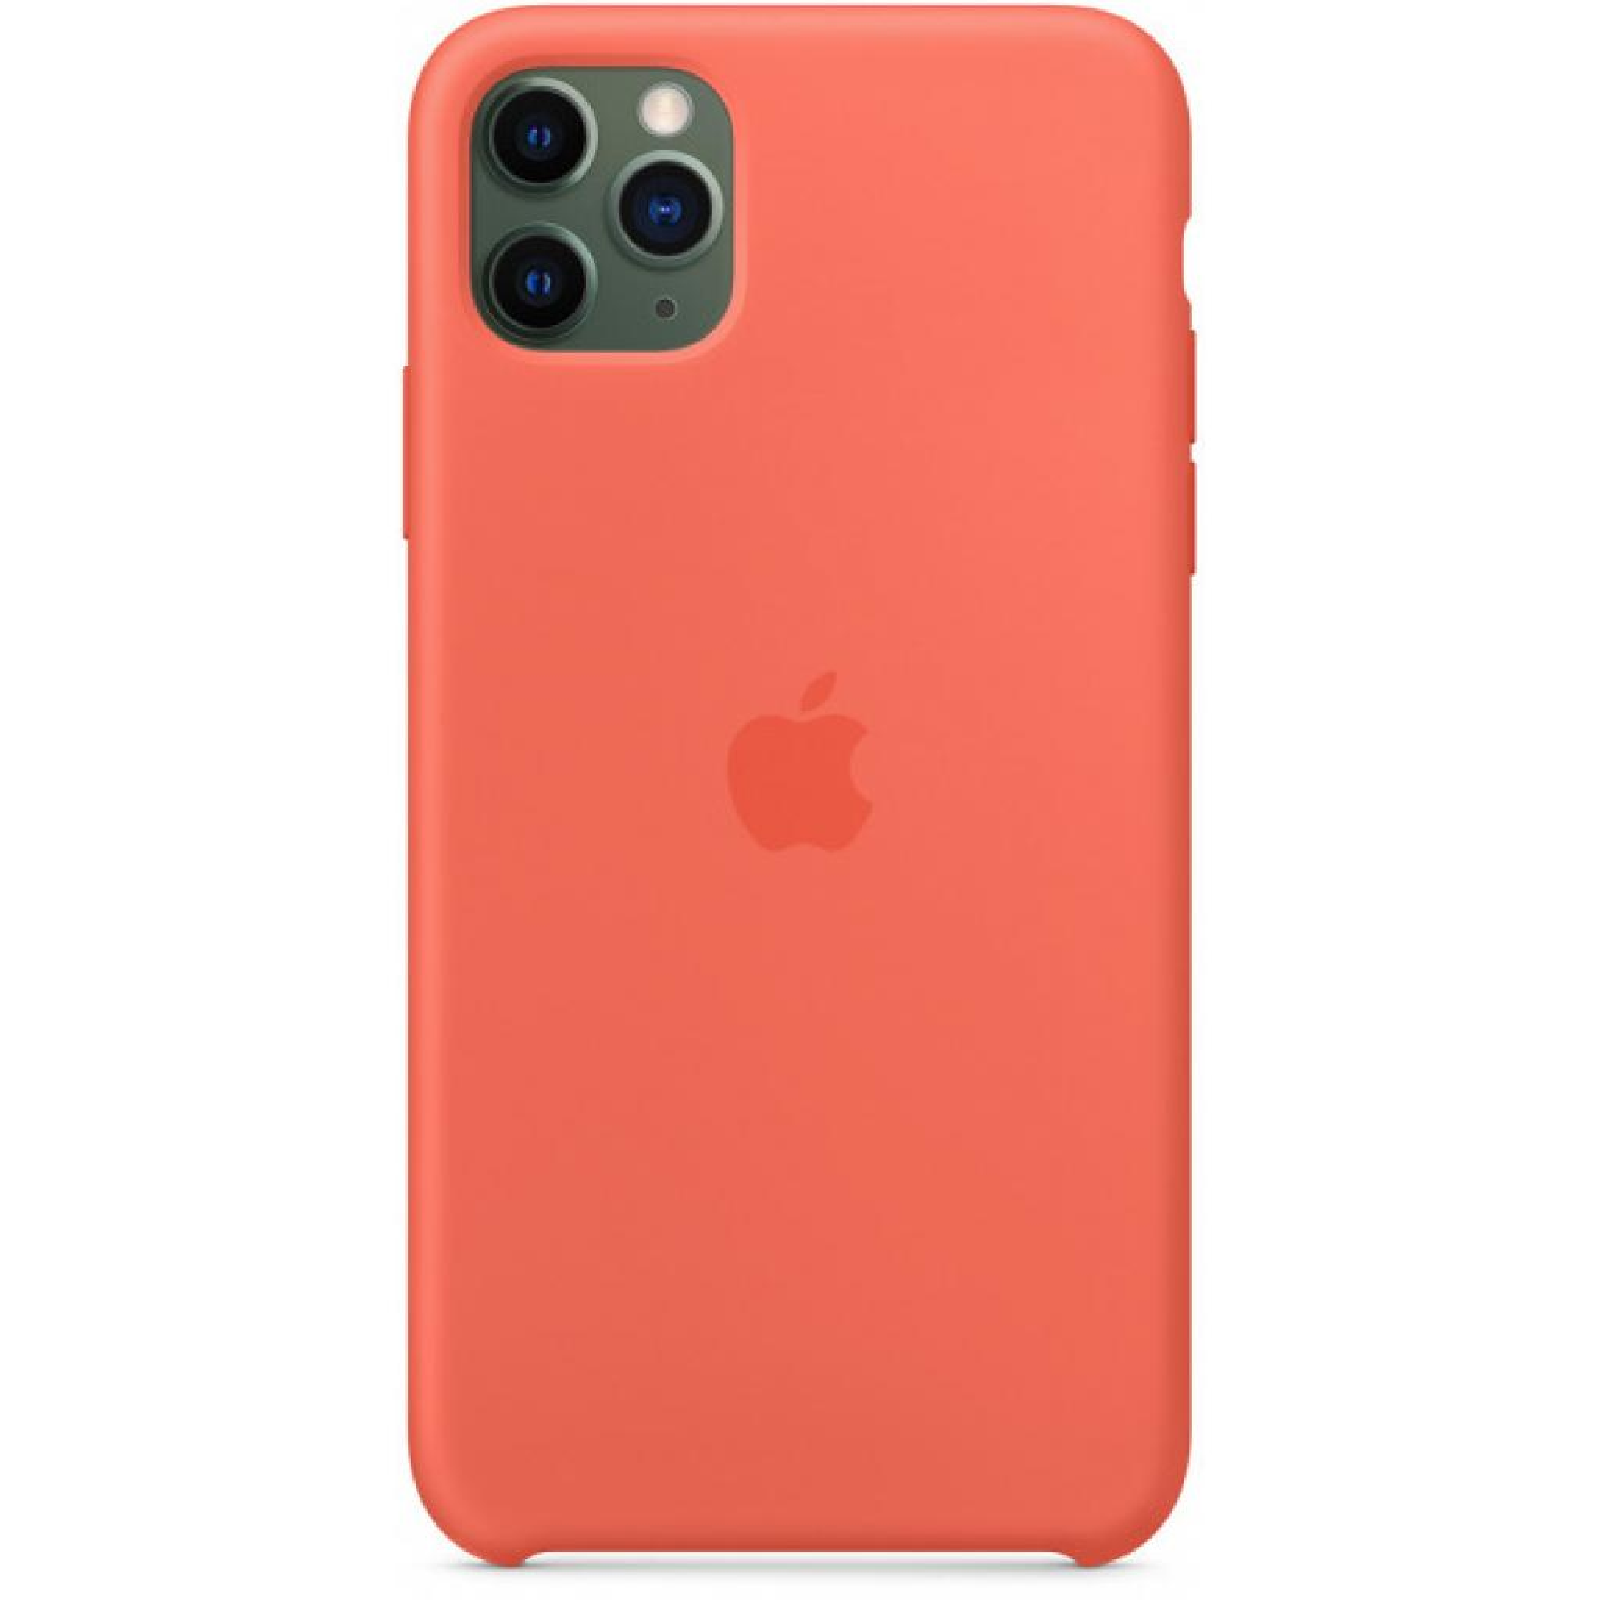 Чехол для моб. телефона Apple iPhone 11 Pro Max Silicone Case - Clementine (Orange) (MX022ZM/A) изображение 3